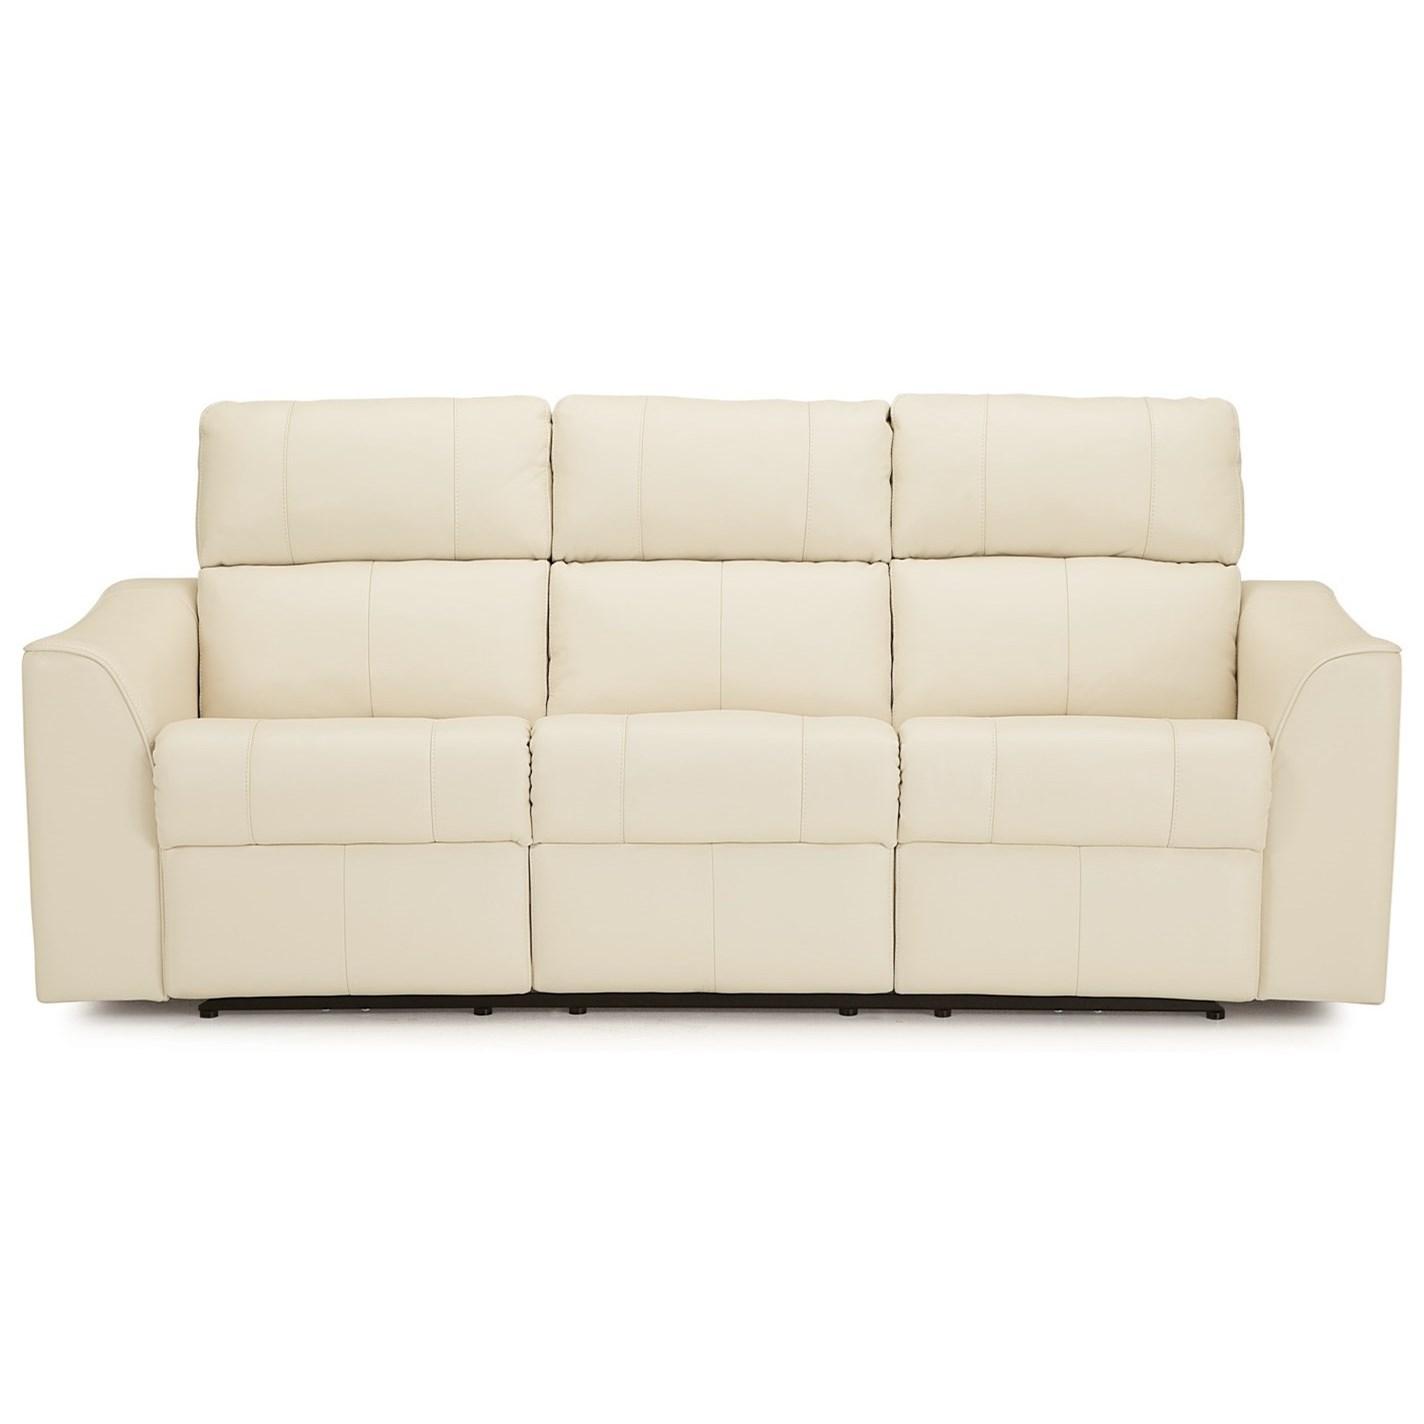 Palliser Topaz 41131-51 Contemporary Reclining Sofa ...